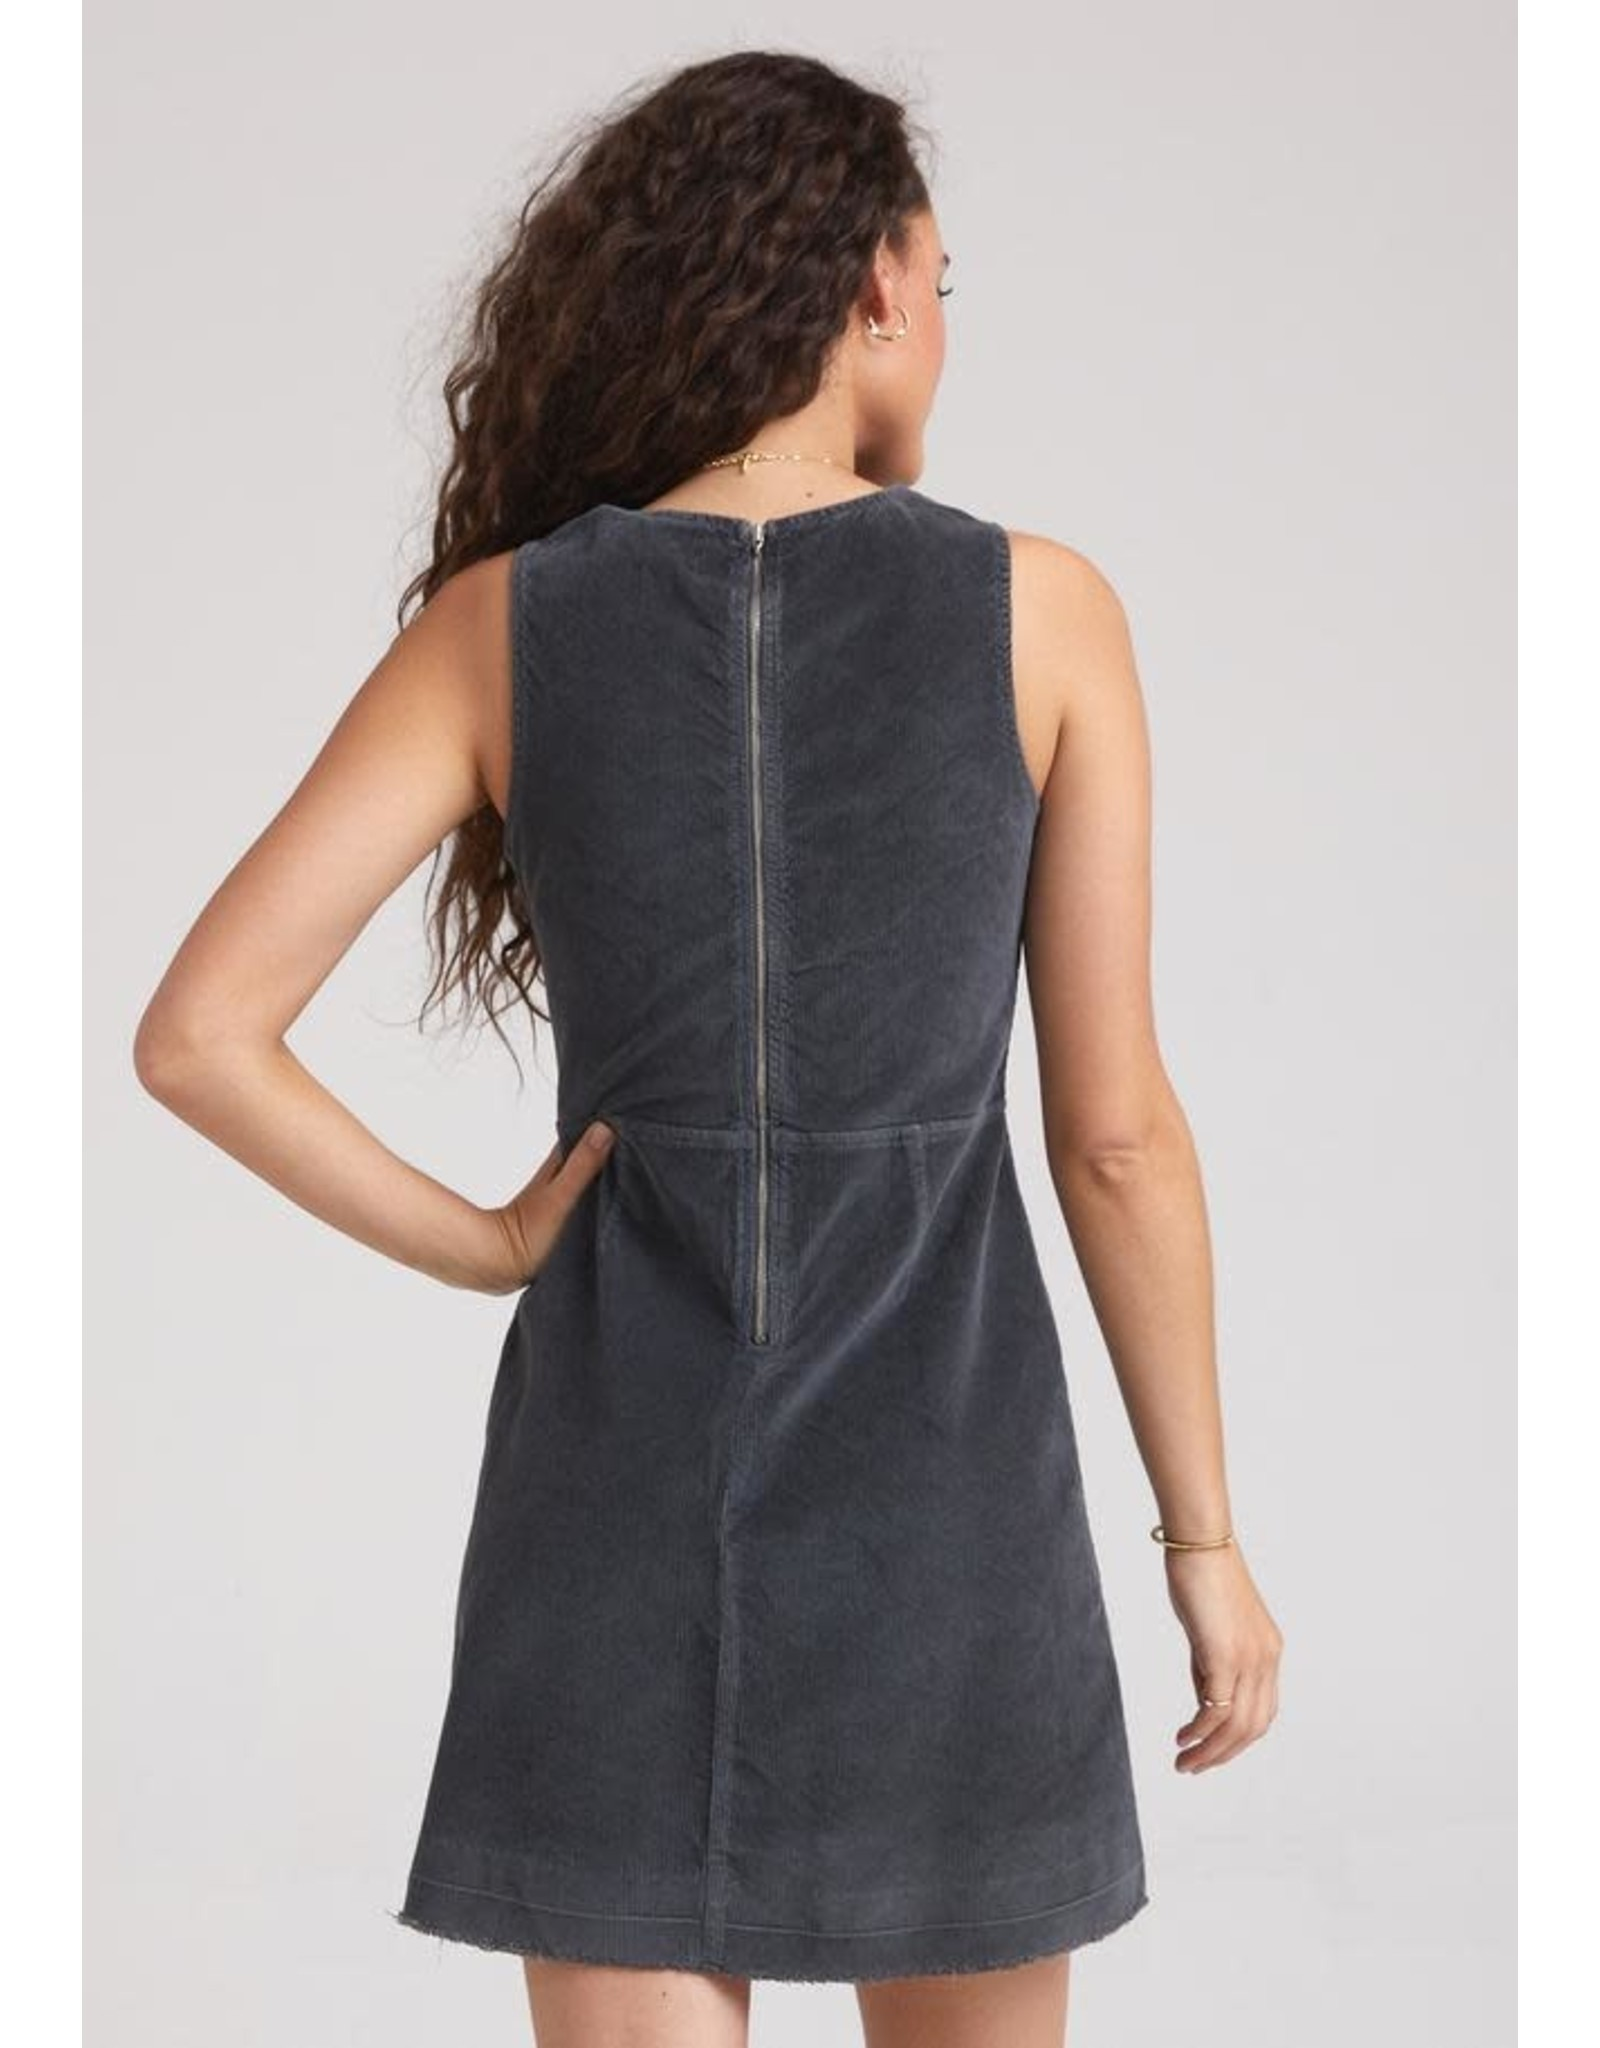 Bella Dahl Fitted Zip Back Dress